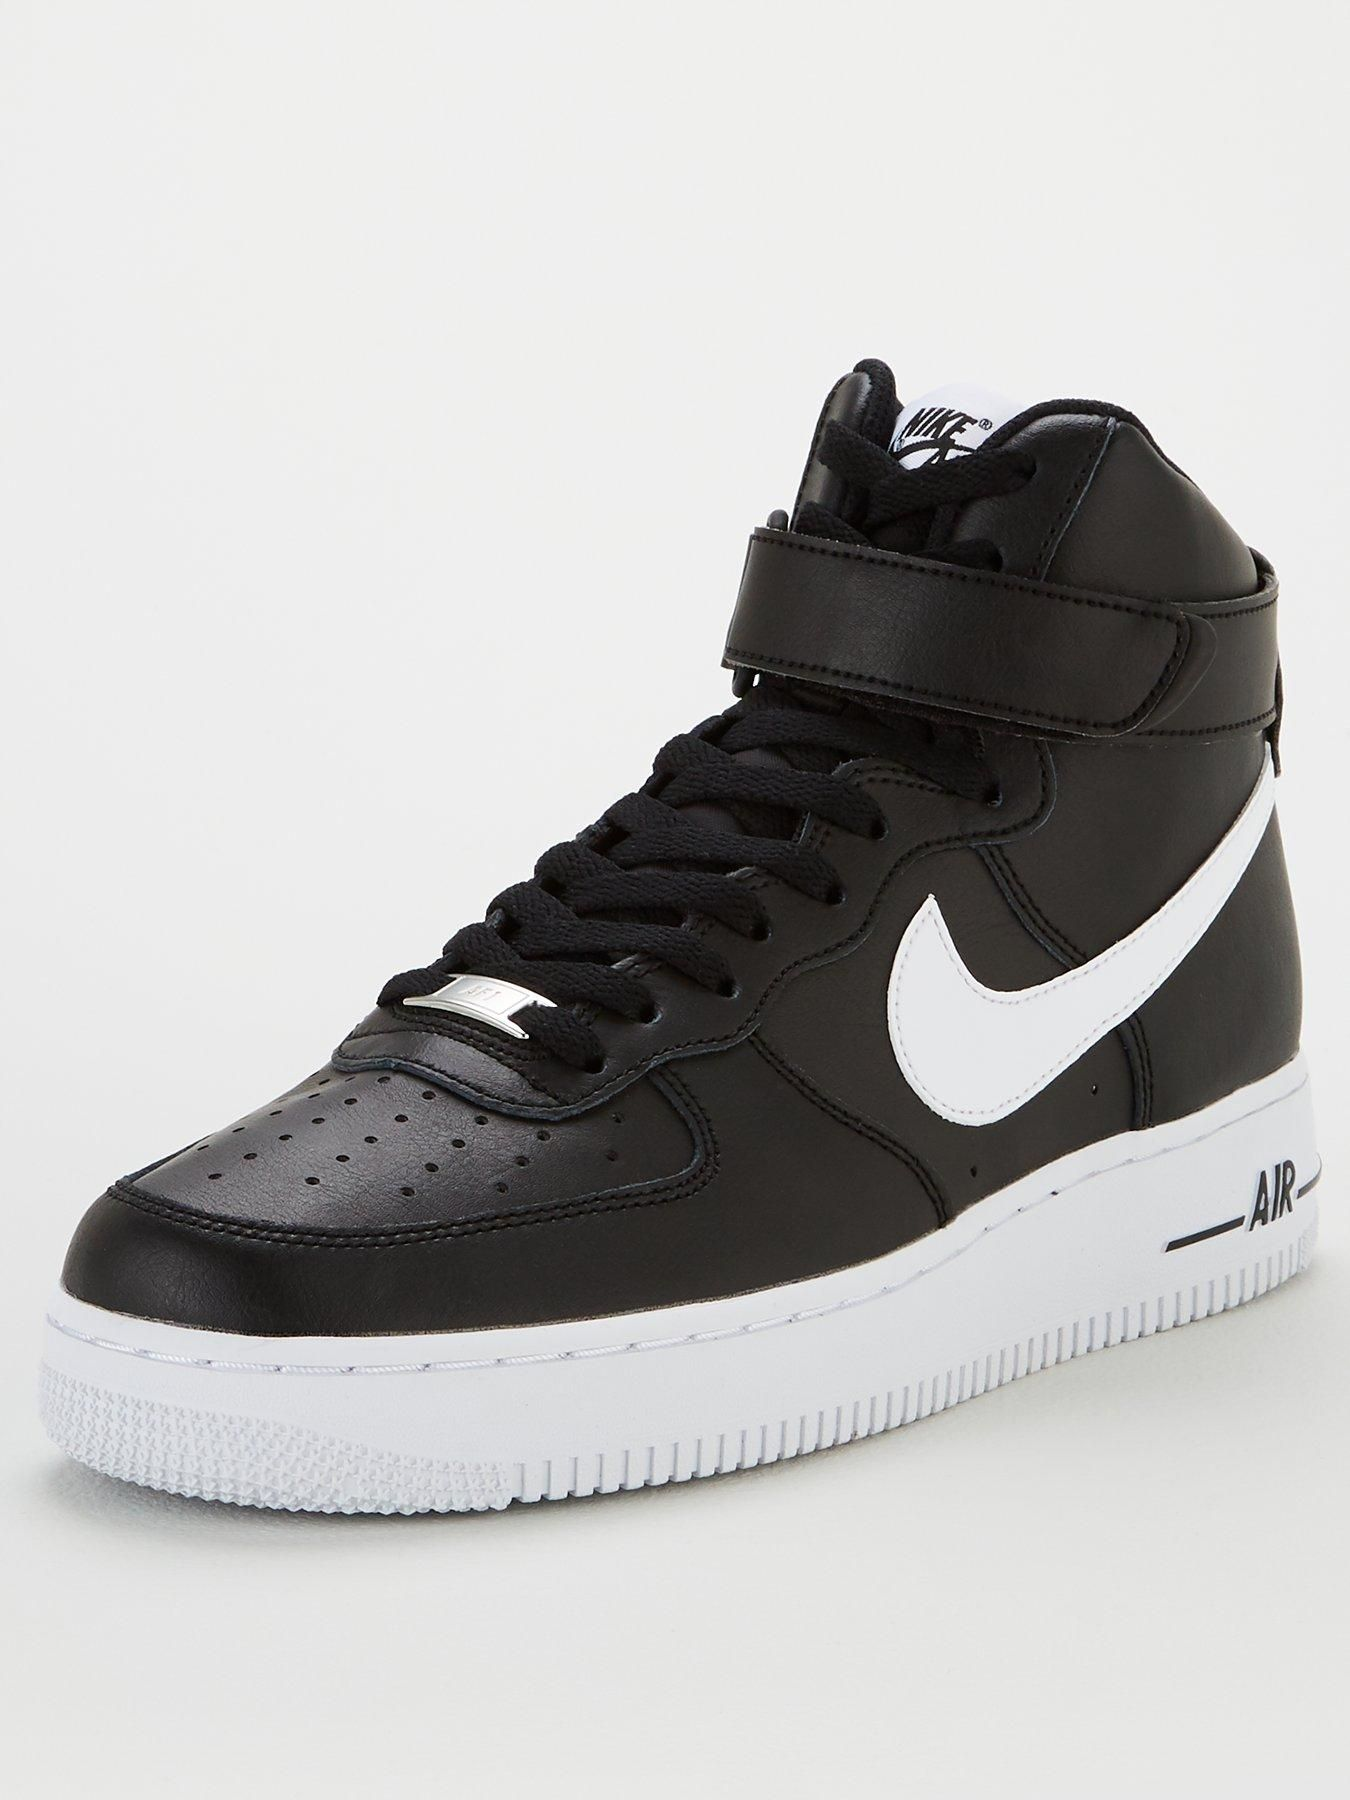 Nike Air Force 1 High '07 An20 Black in Black/White